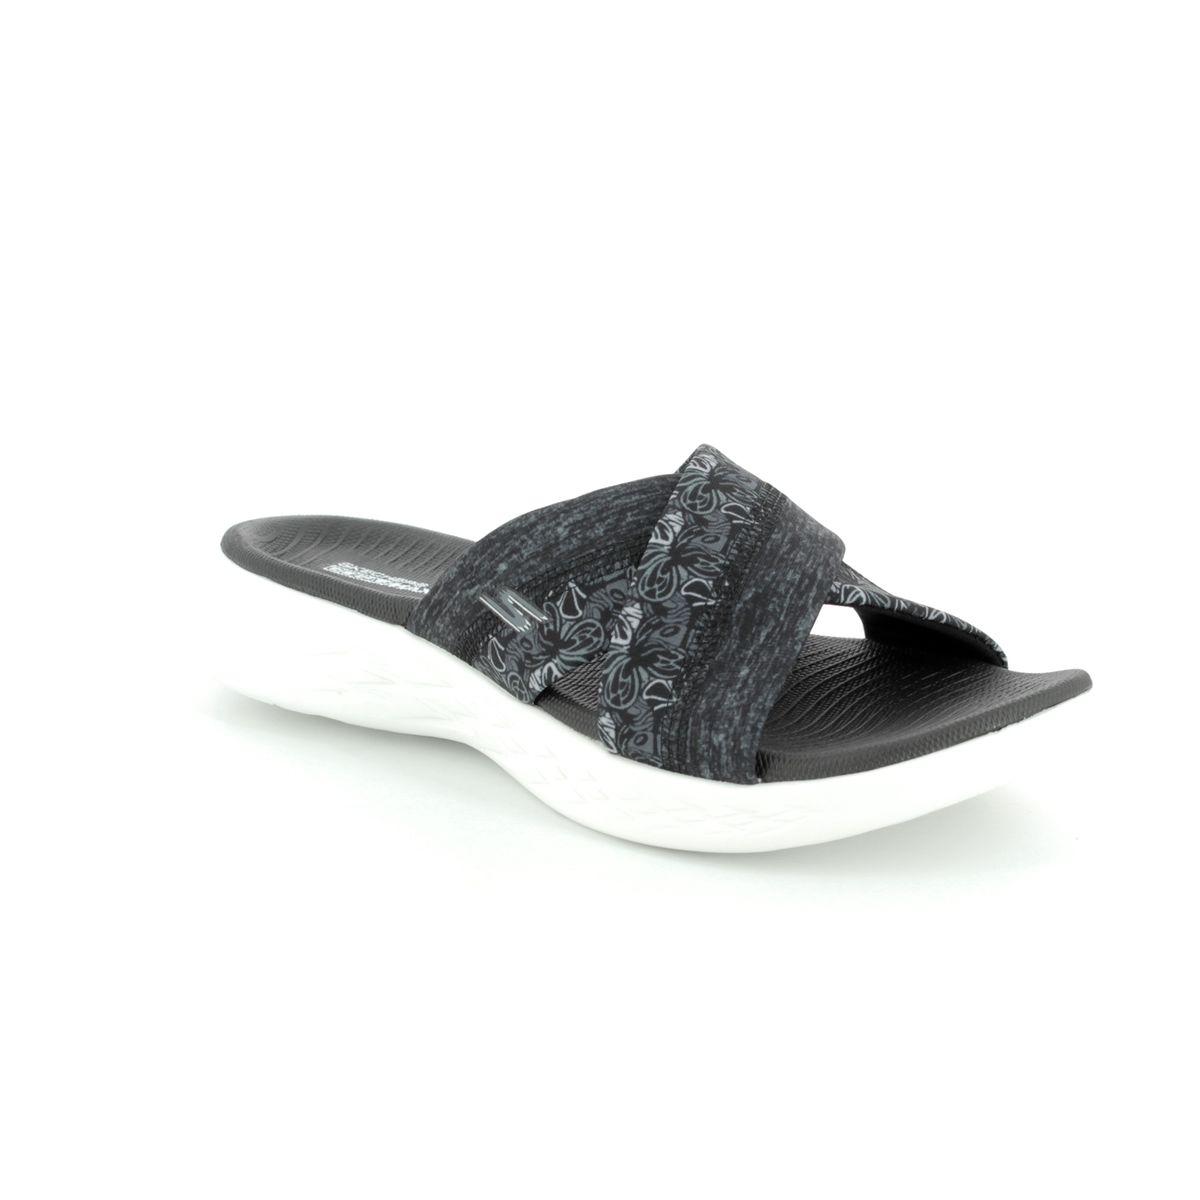 93597cb3958d Skechers Monarch 600 15306 BKW Black-white sandals